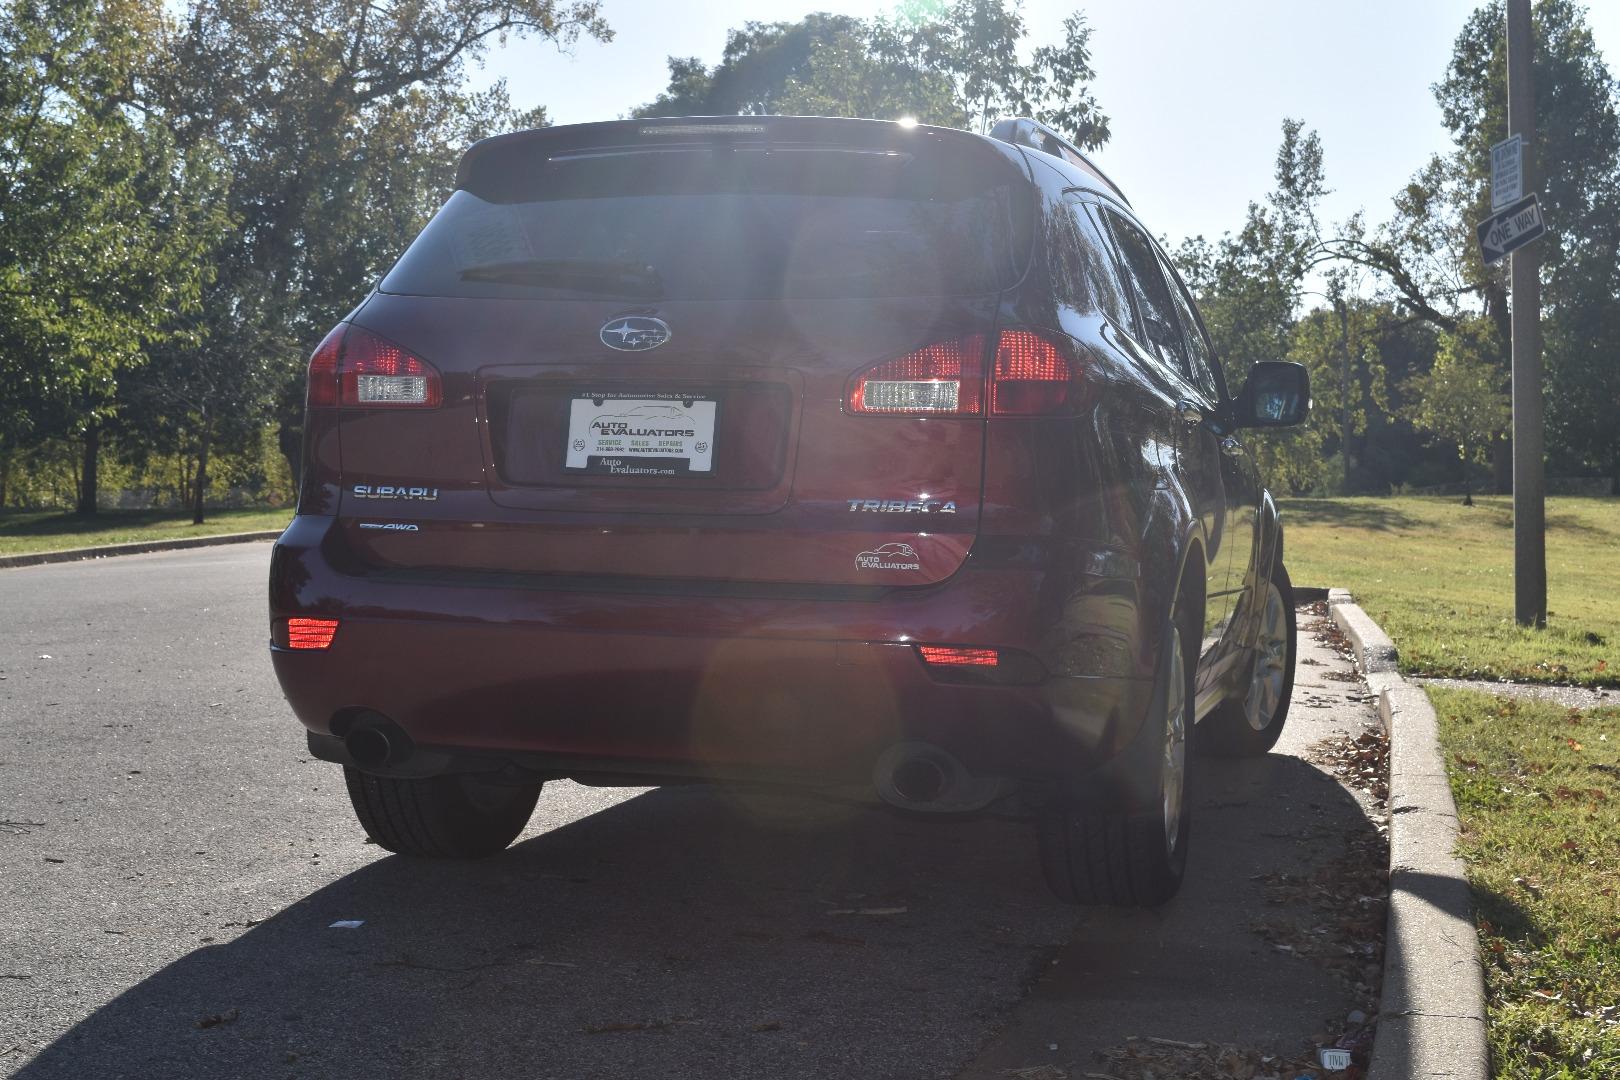 2011 subaru tribeca 4dr 3 6r limited w pwr moonroof pkg nav system auto evaluators dealership in st louis auto evaluators